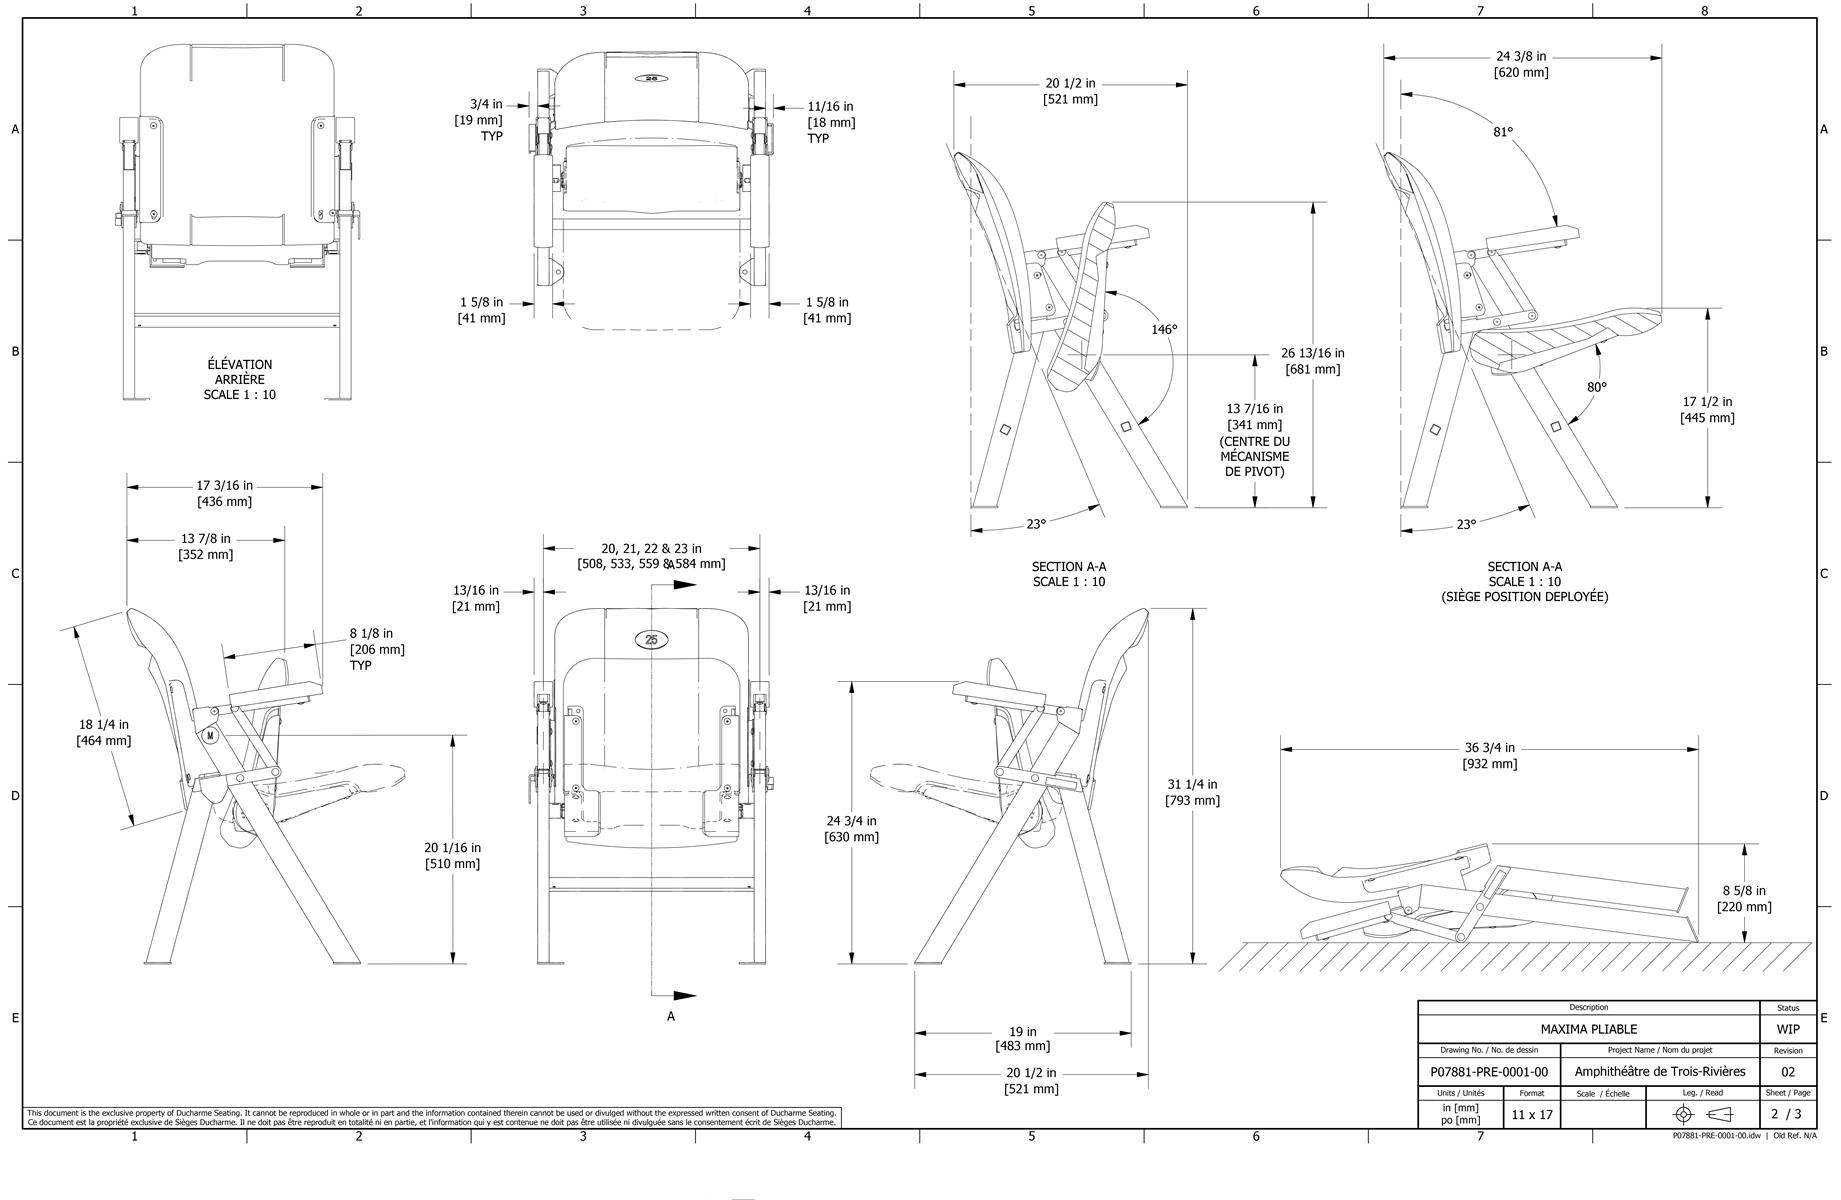 ATRV-Sièges-amovibles-02_1841x1200.jpg